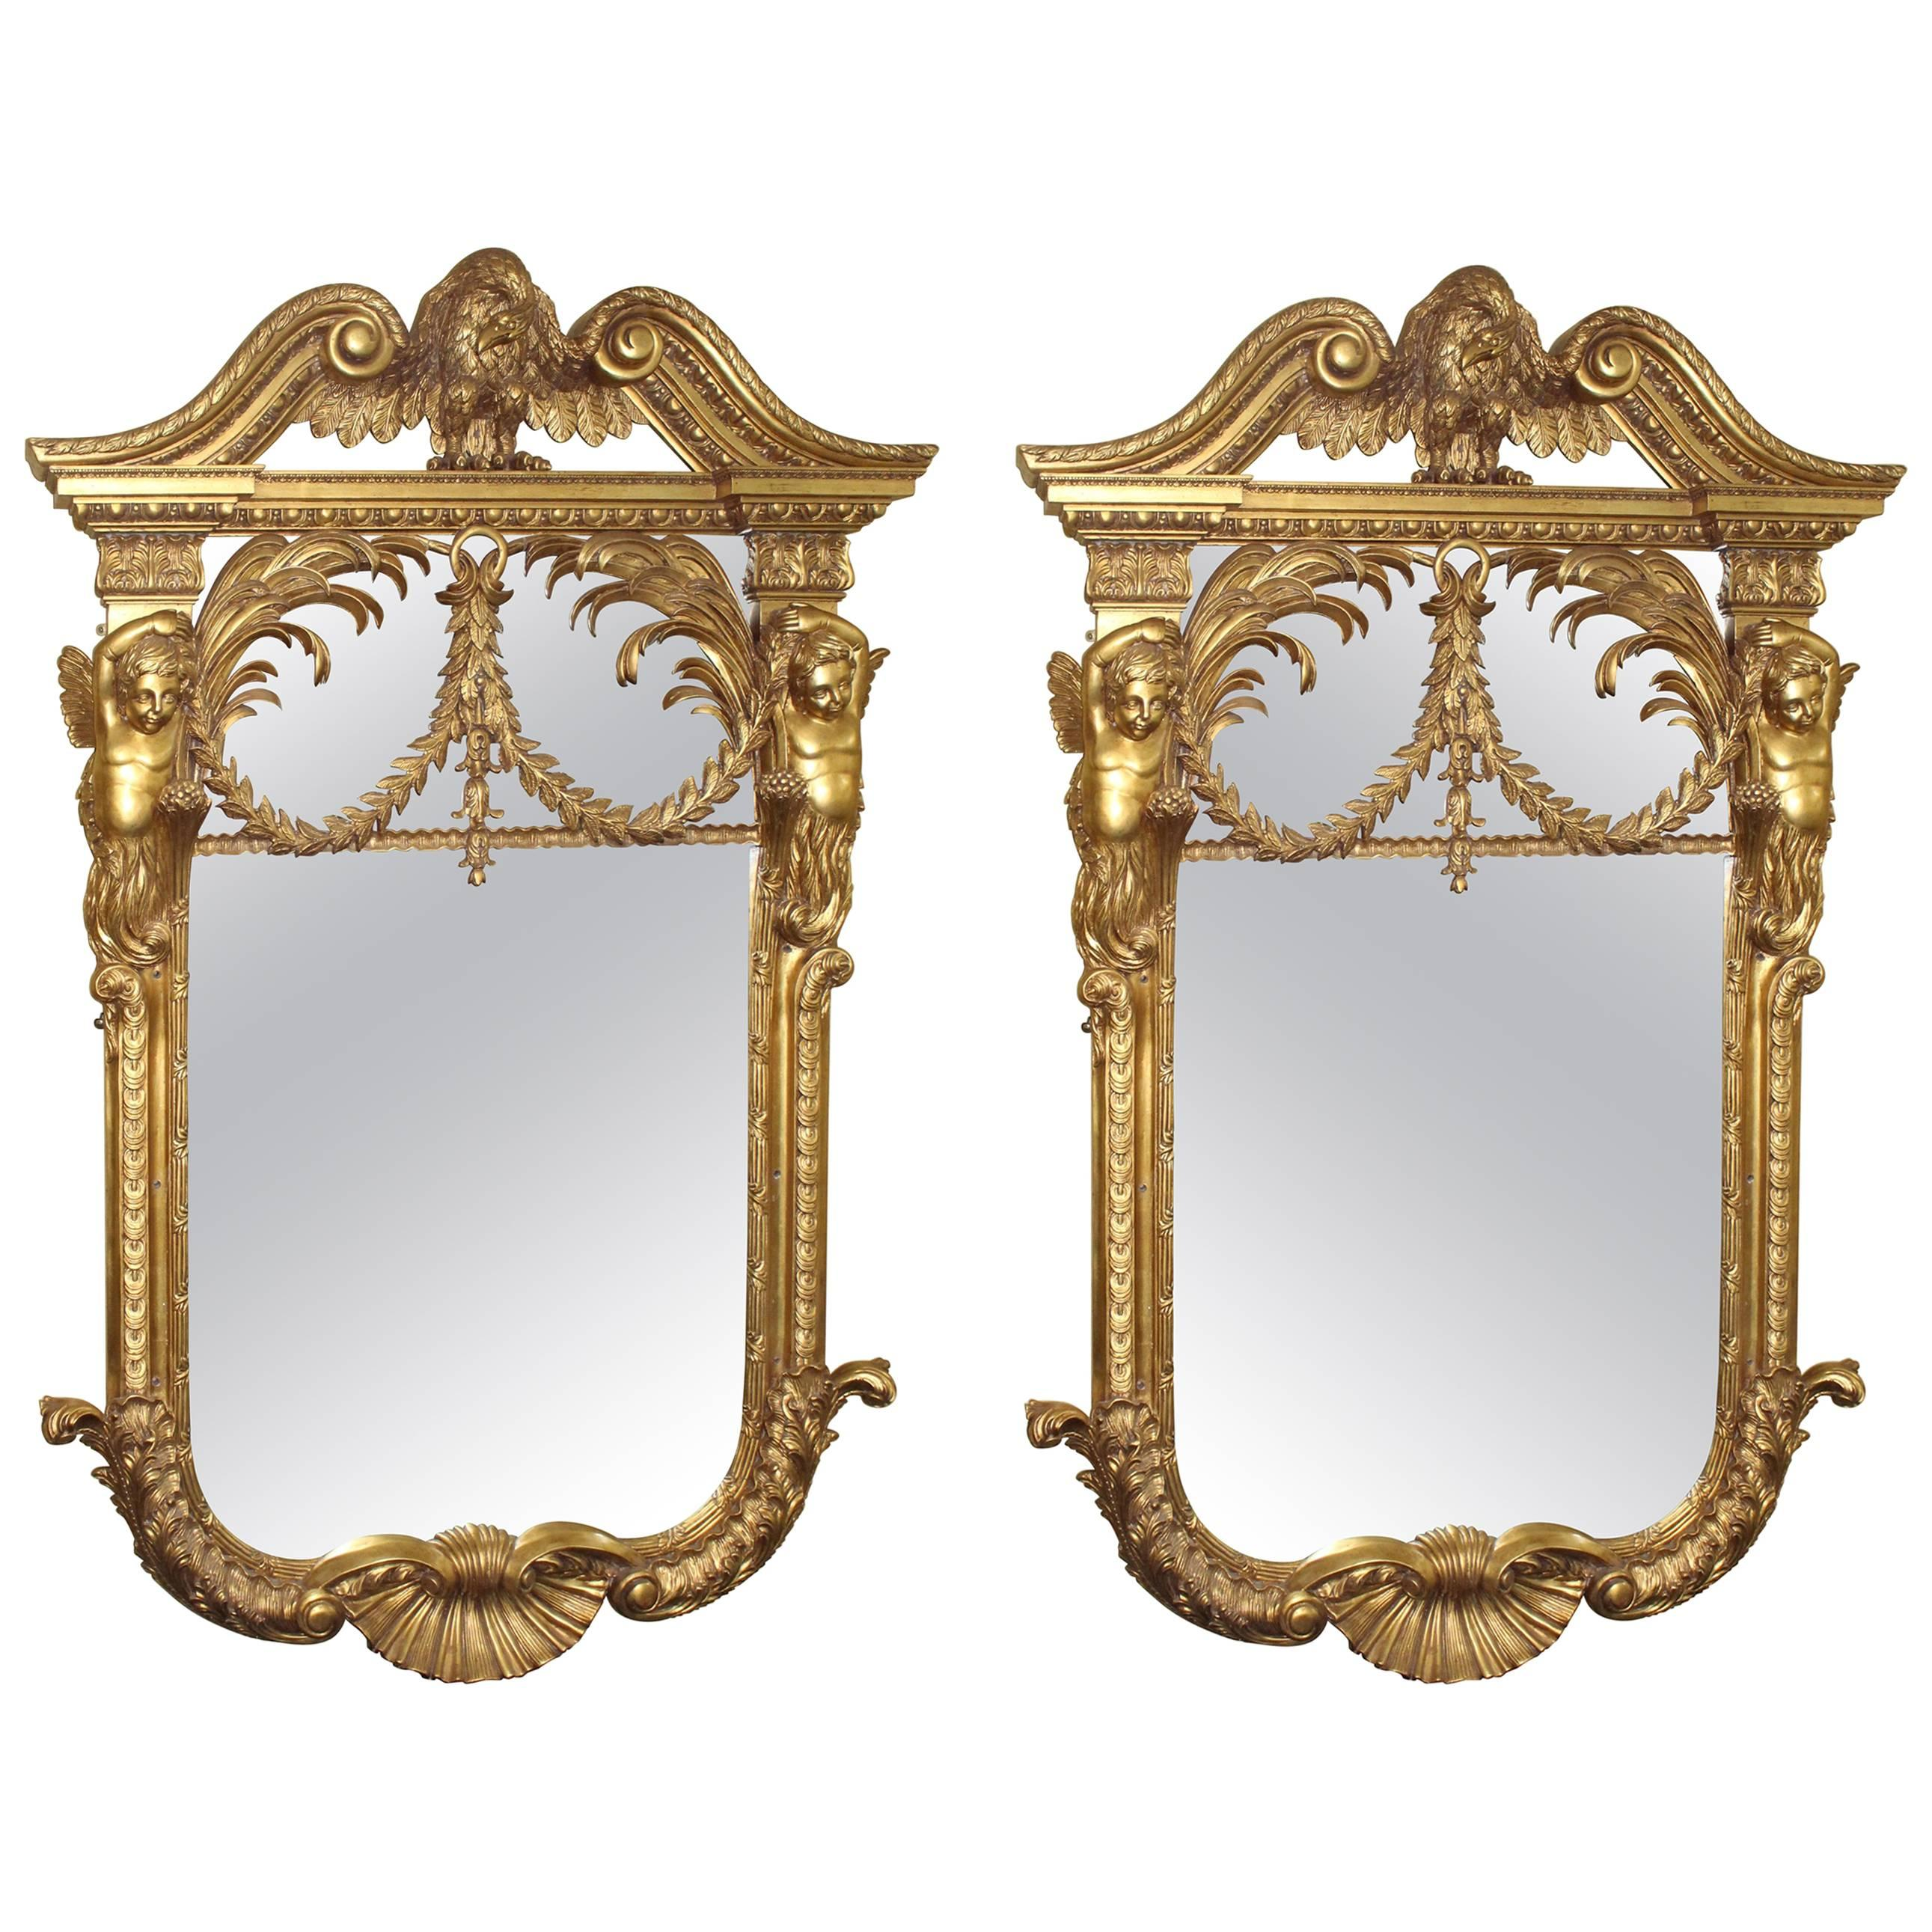 Ornate hand mirror Mirror Clipart Black White Superb Pair Of Ornate Handcarved Gilt Mirrors For Sale 1stdibs Superb Pair Of Ornate Handcarved Gilt Mirrors For Sale At 1stdibs